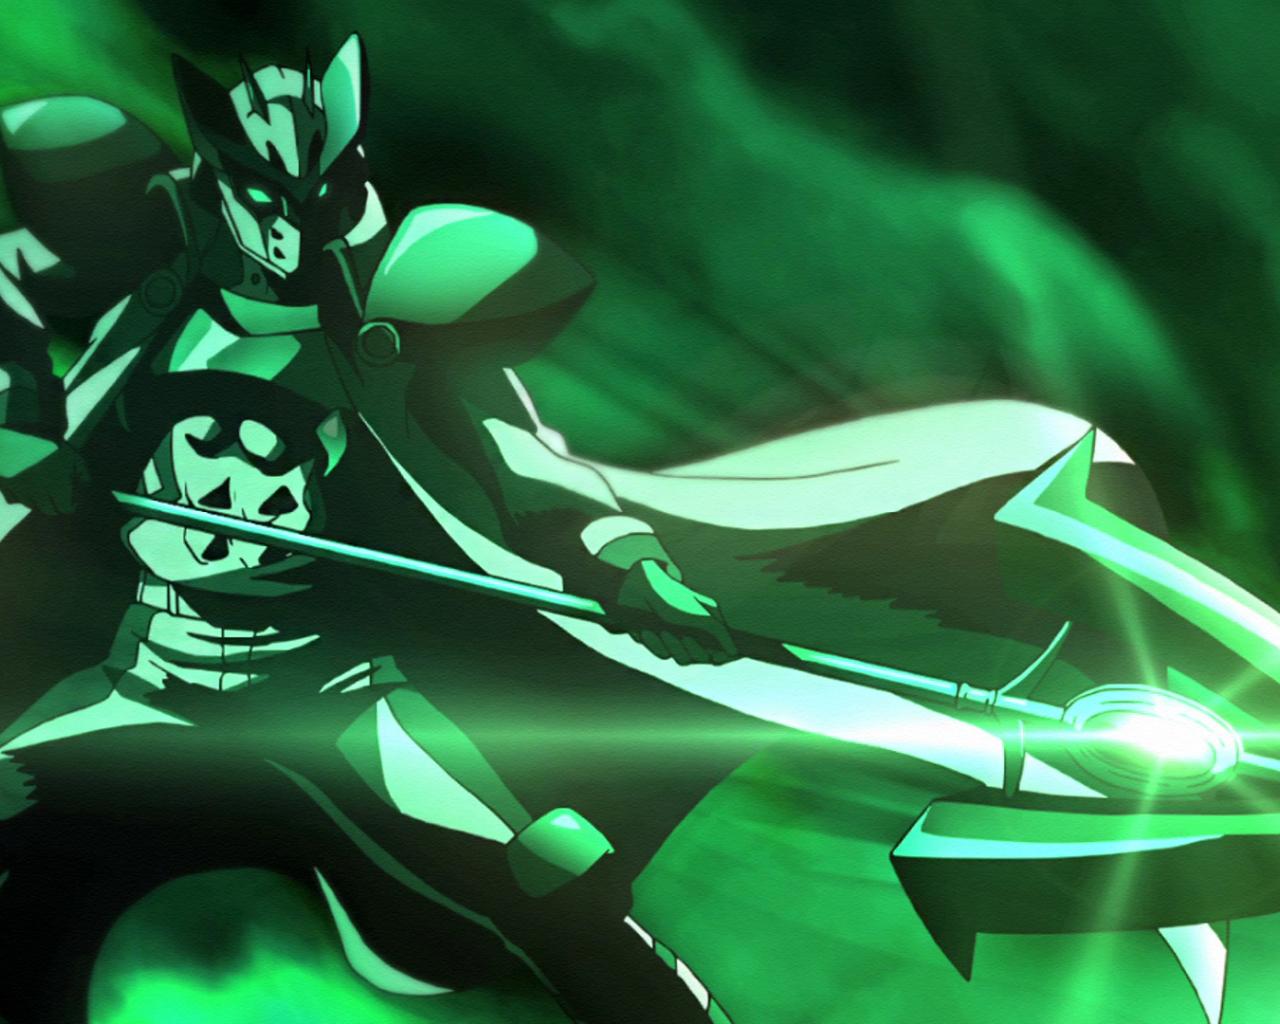 Free Download Akame Ga Kill Spear Desktop Background Hd 1920x1080